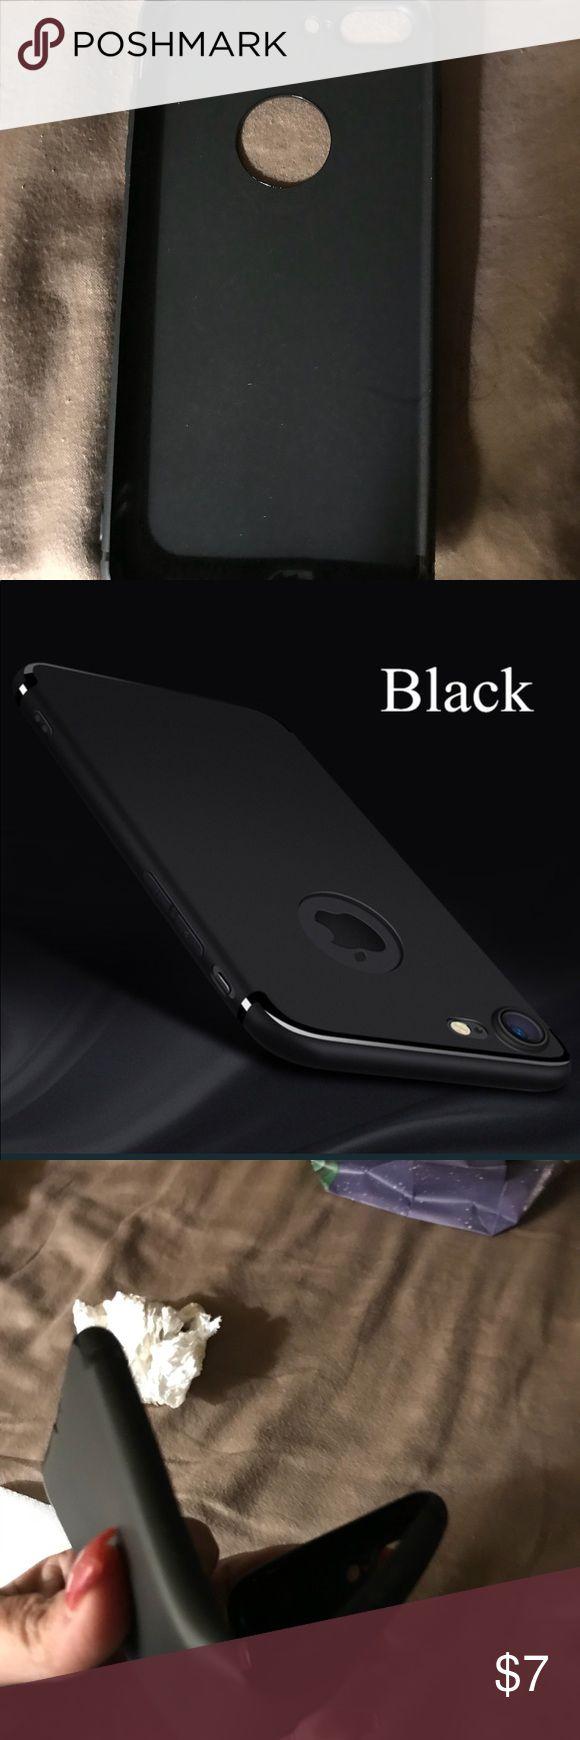 IPhone 7plus phone case Silicone iPhone 7 plus phone case/cover. Soft matte 360 cover. Anti-fingerprint. Black (NEW) Accessories Phone Cases